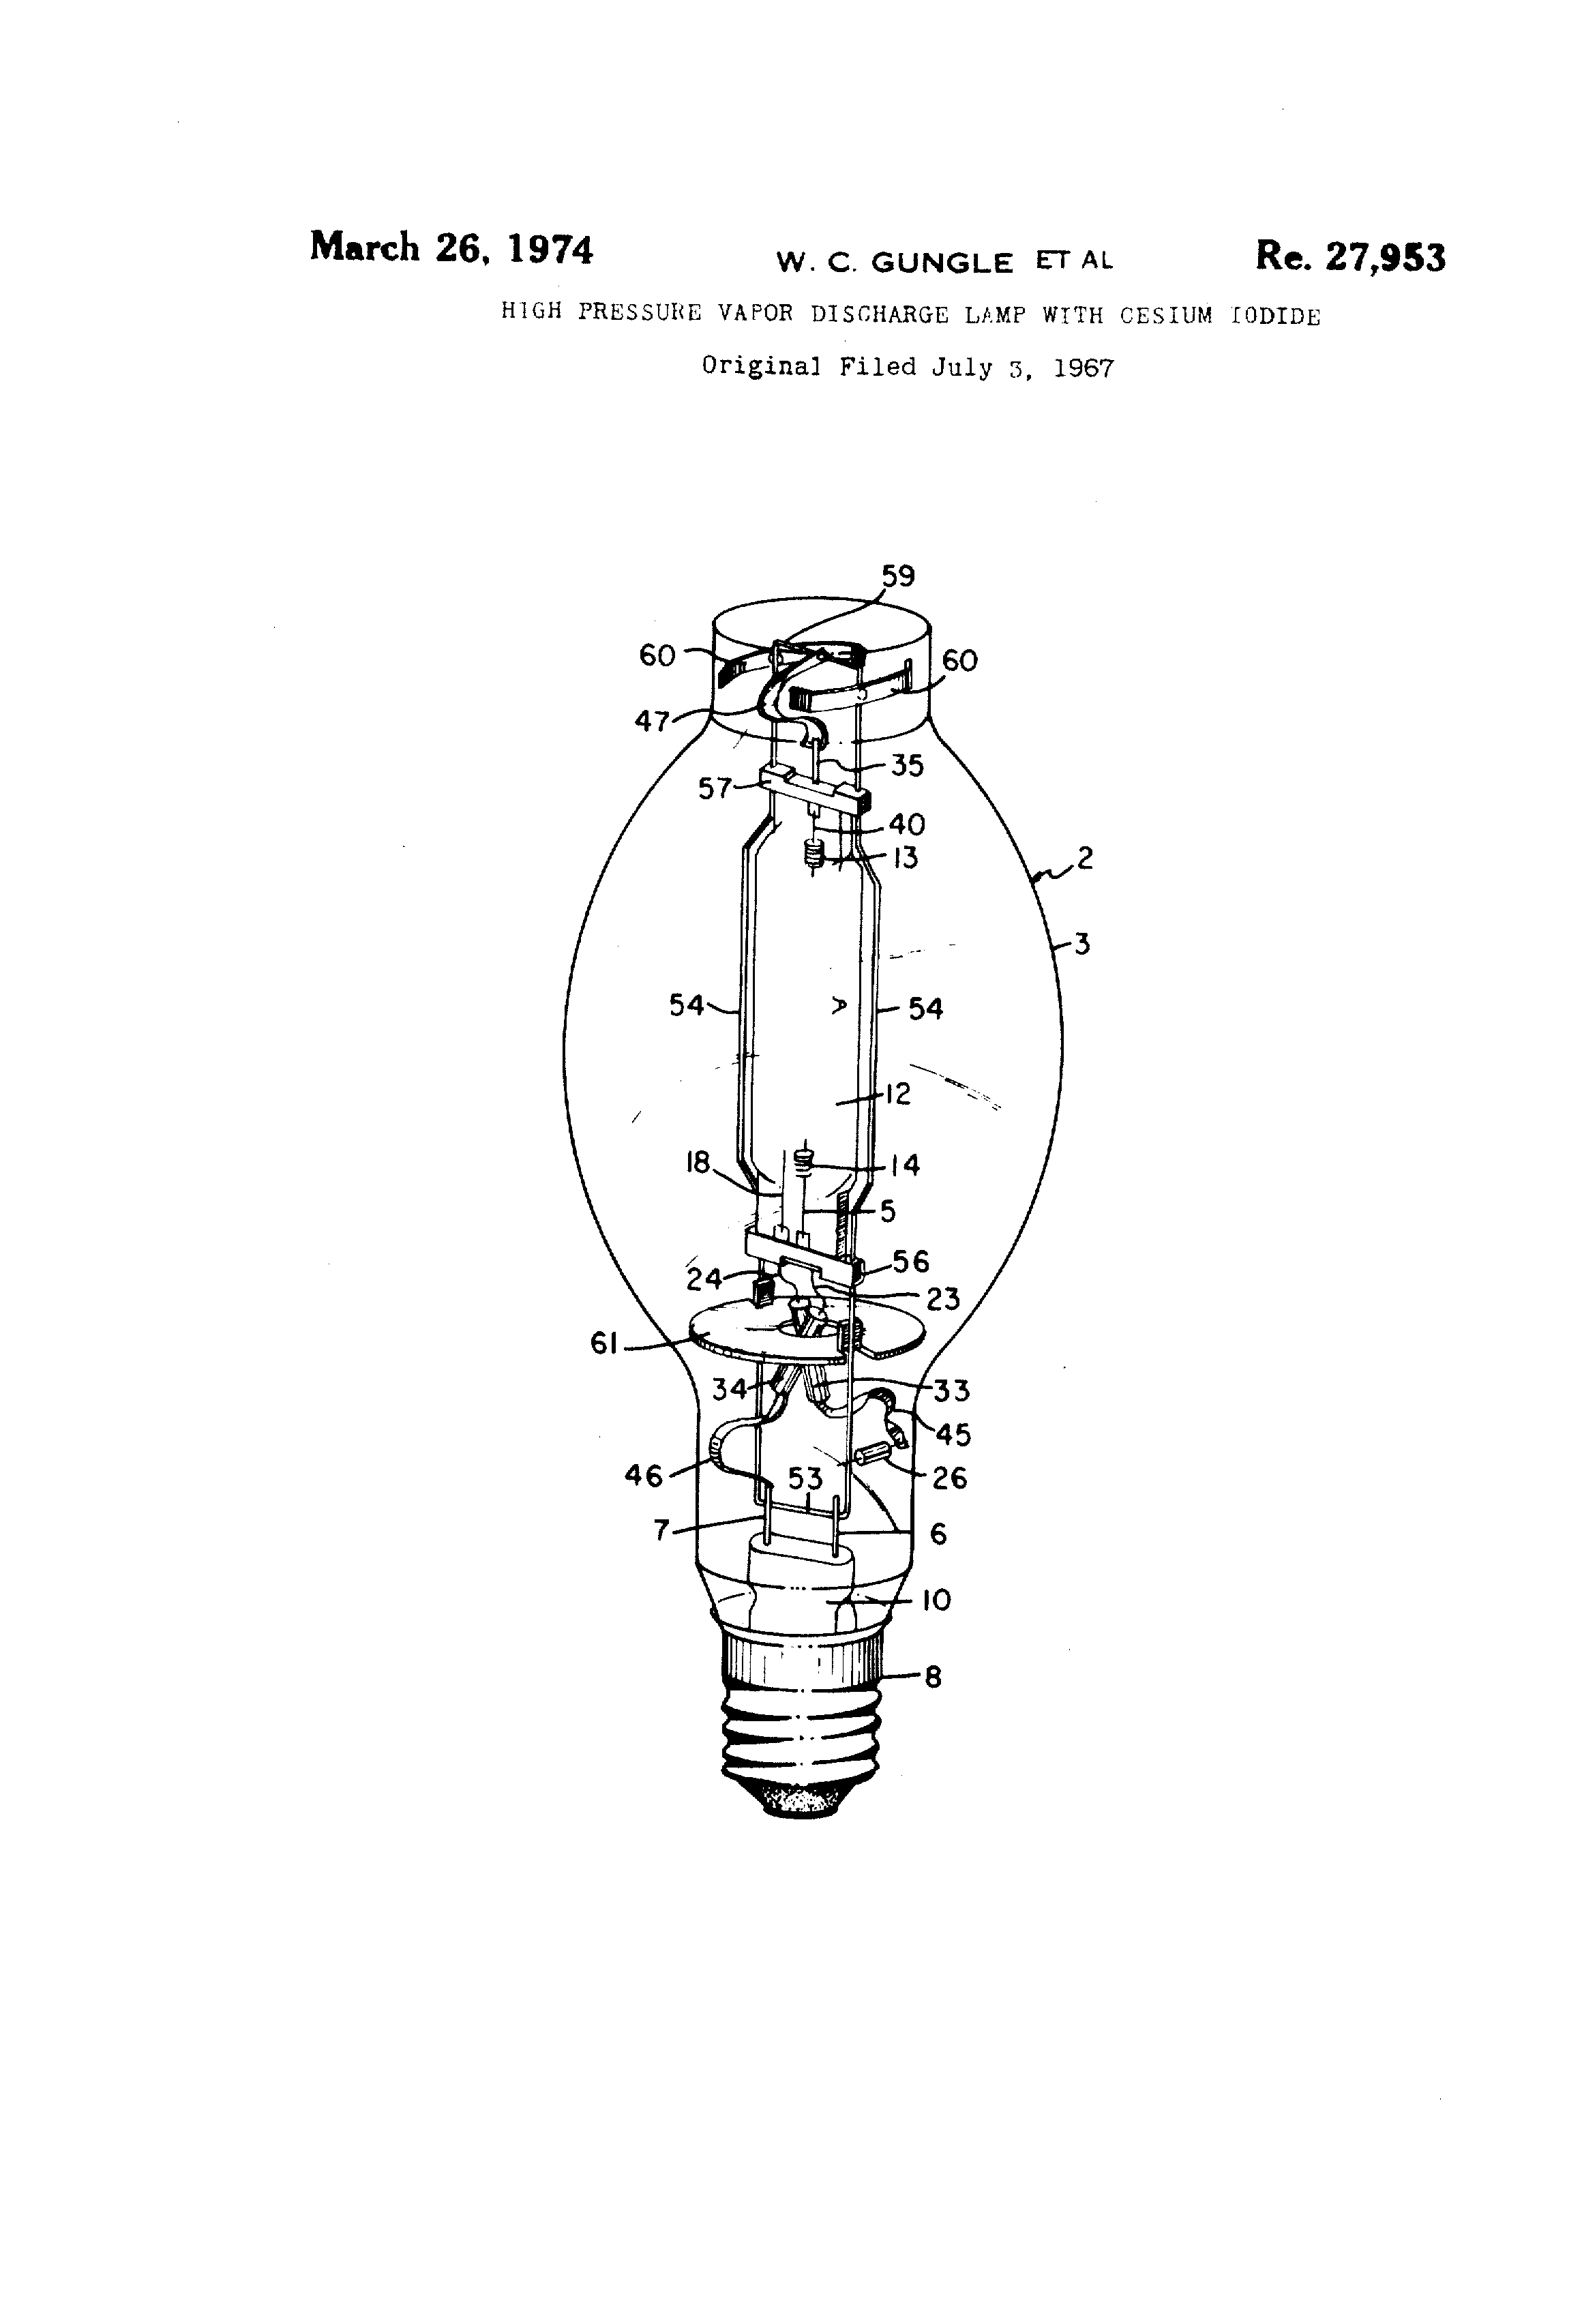 Patent USRE27953 - High pressure vapor discharge lamp with cesium